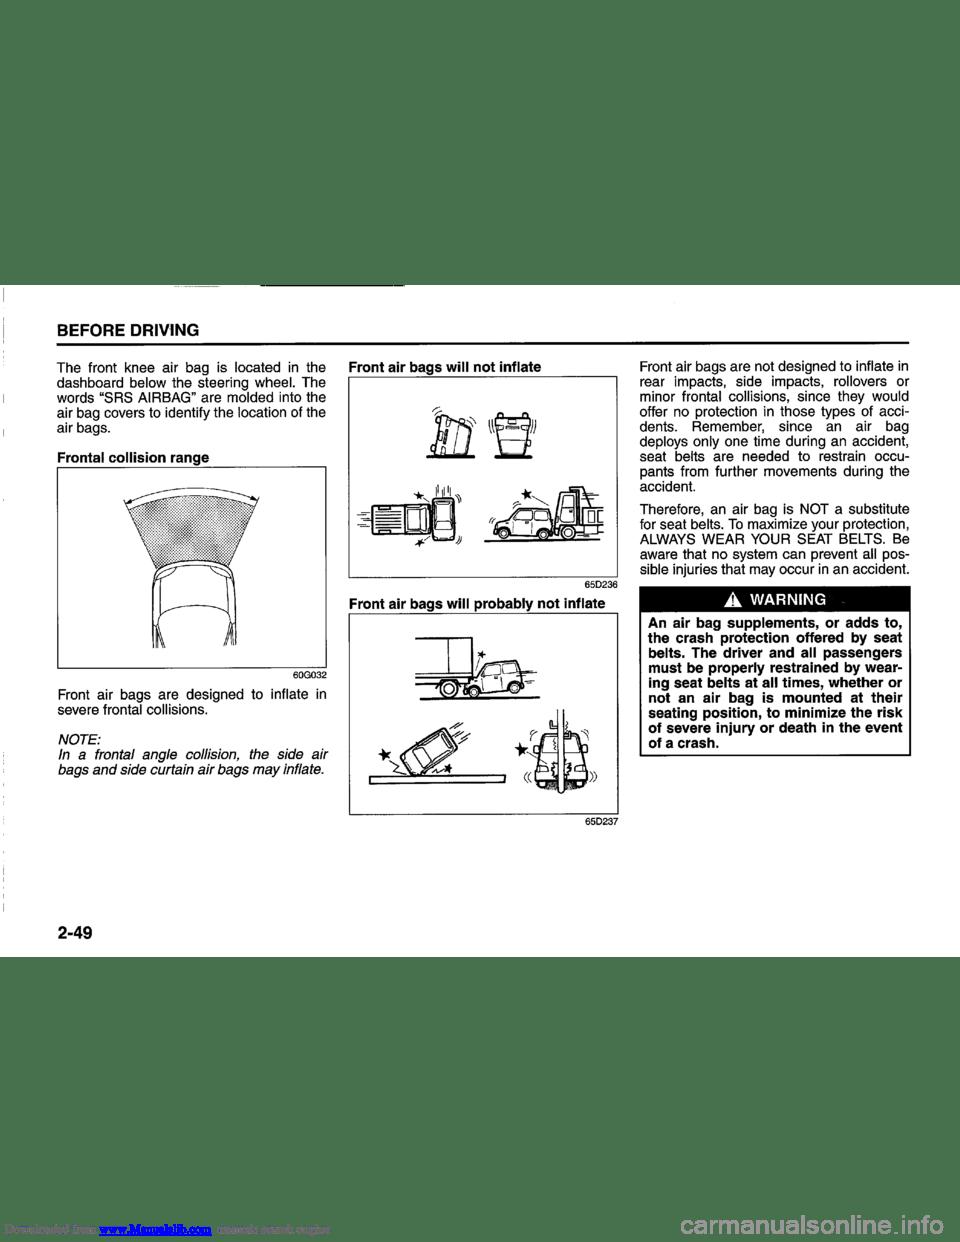 SUZUKI SWIFT 2009 2.G Repair Manual (358 Pages)